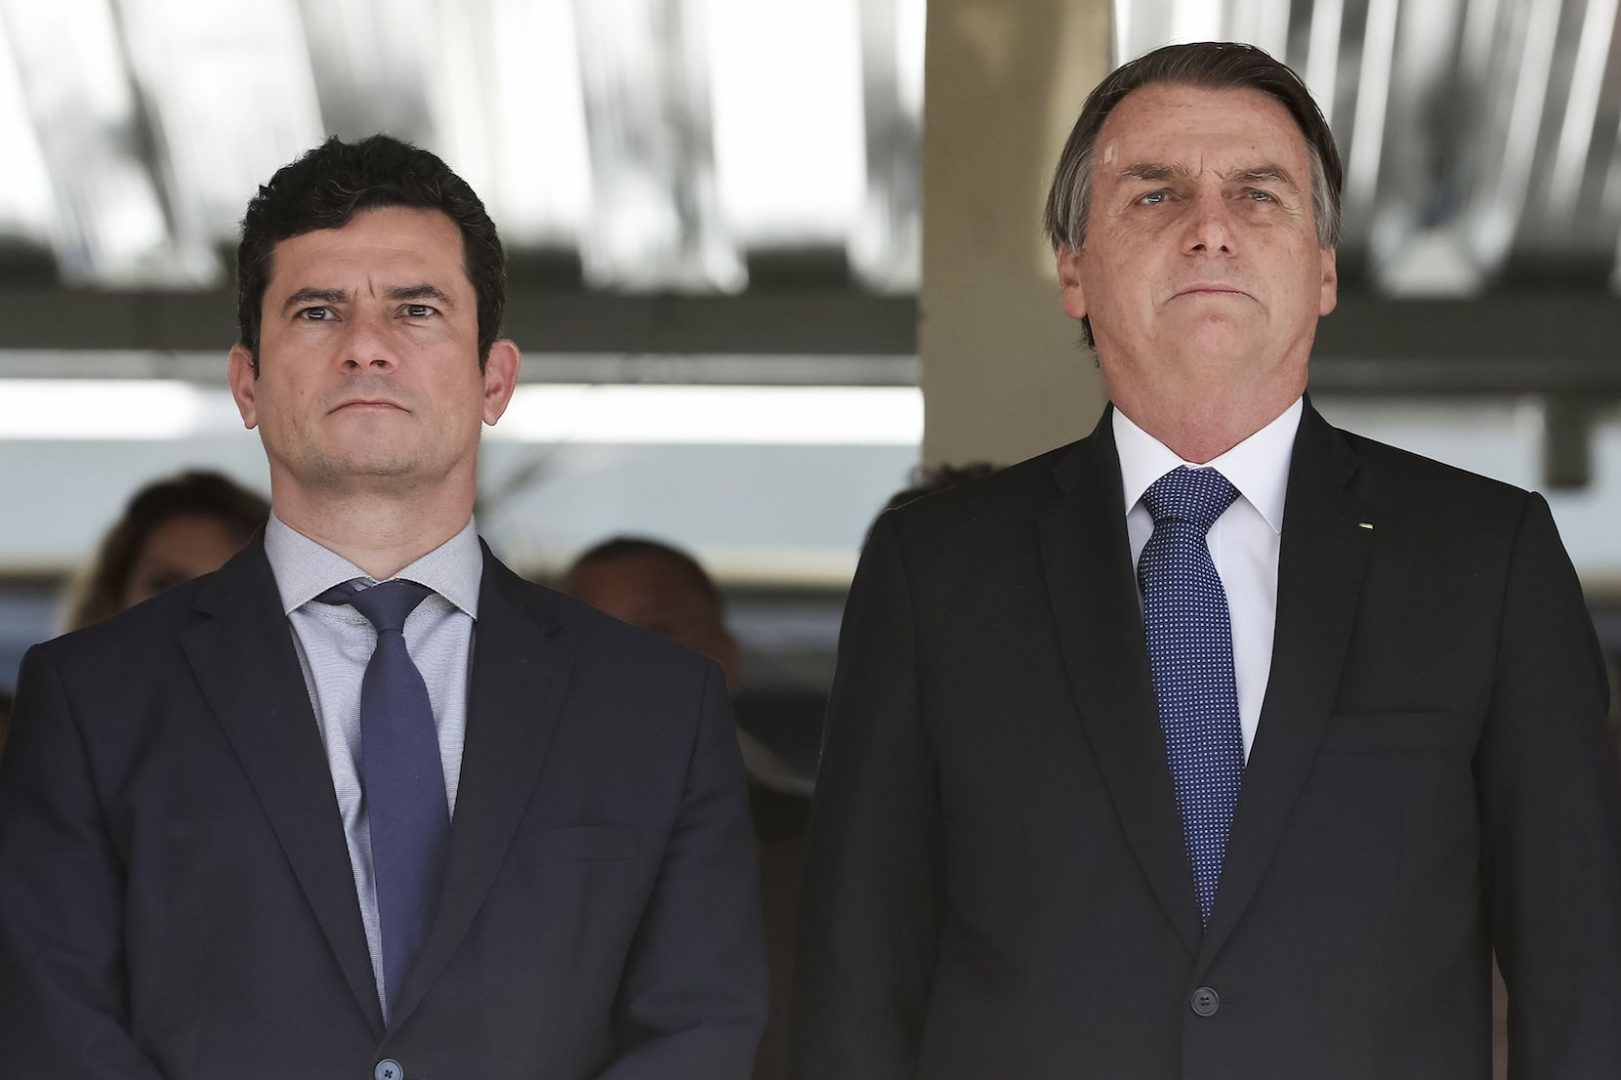 Brazil's President Jair Bolsonaro, right, and Justice Minister Sergio Moro attend a military ceremony in Brasilia, Brazil, 2019.  (Marcos Correa/Brazil's Presidential Press Office via AP)